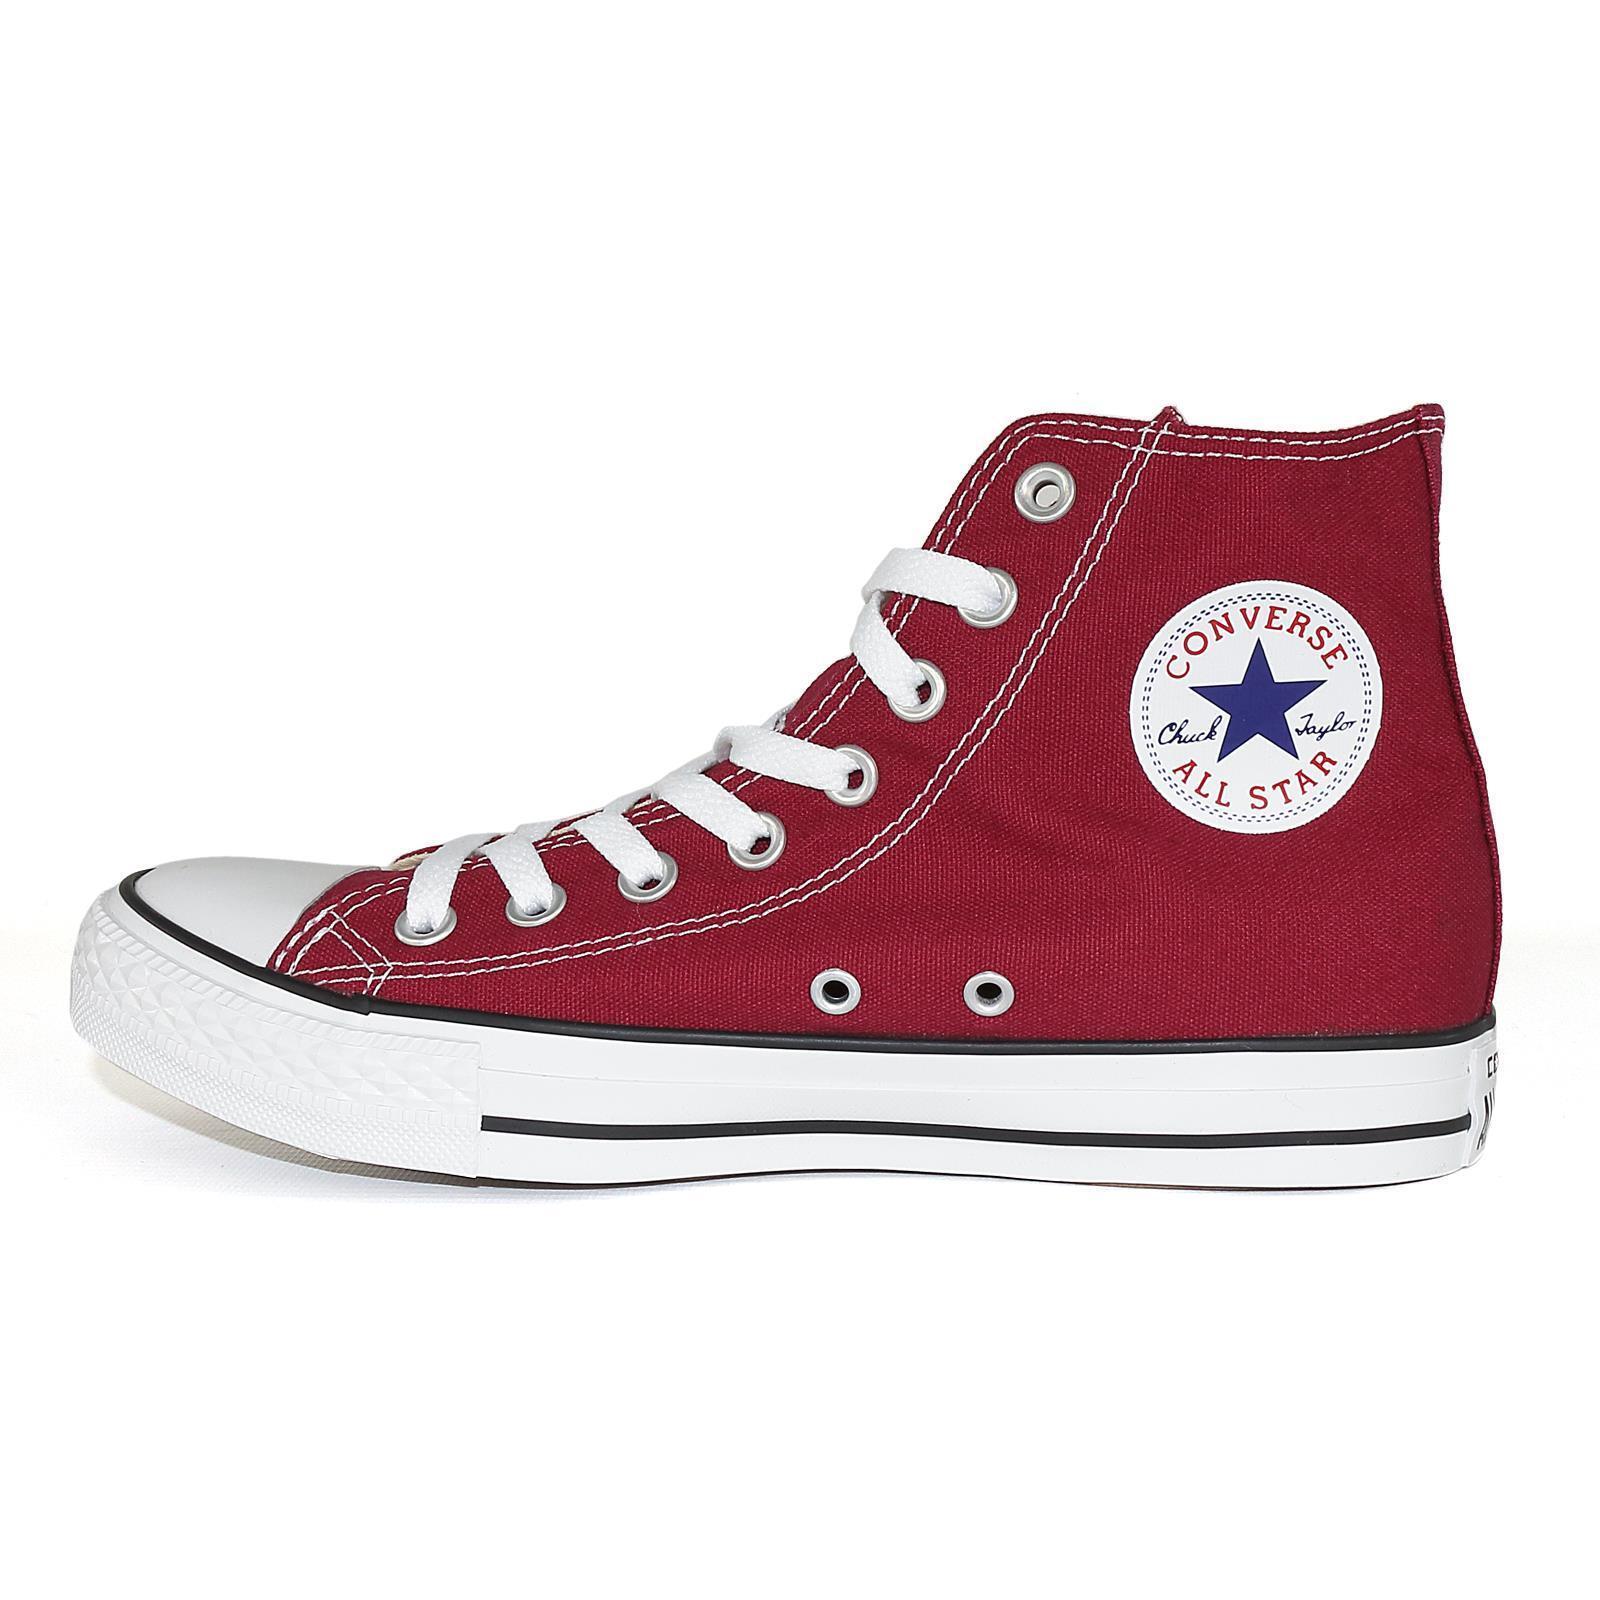 Converse All Star Hi Chucks Sneaker unisex Schuhe, Farbe maroon, 50669